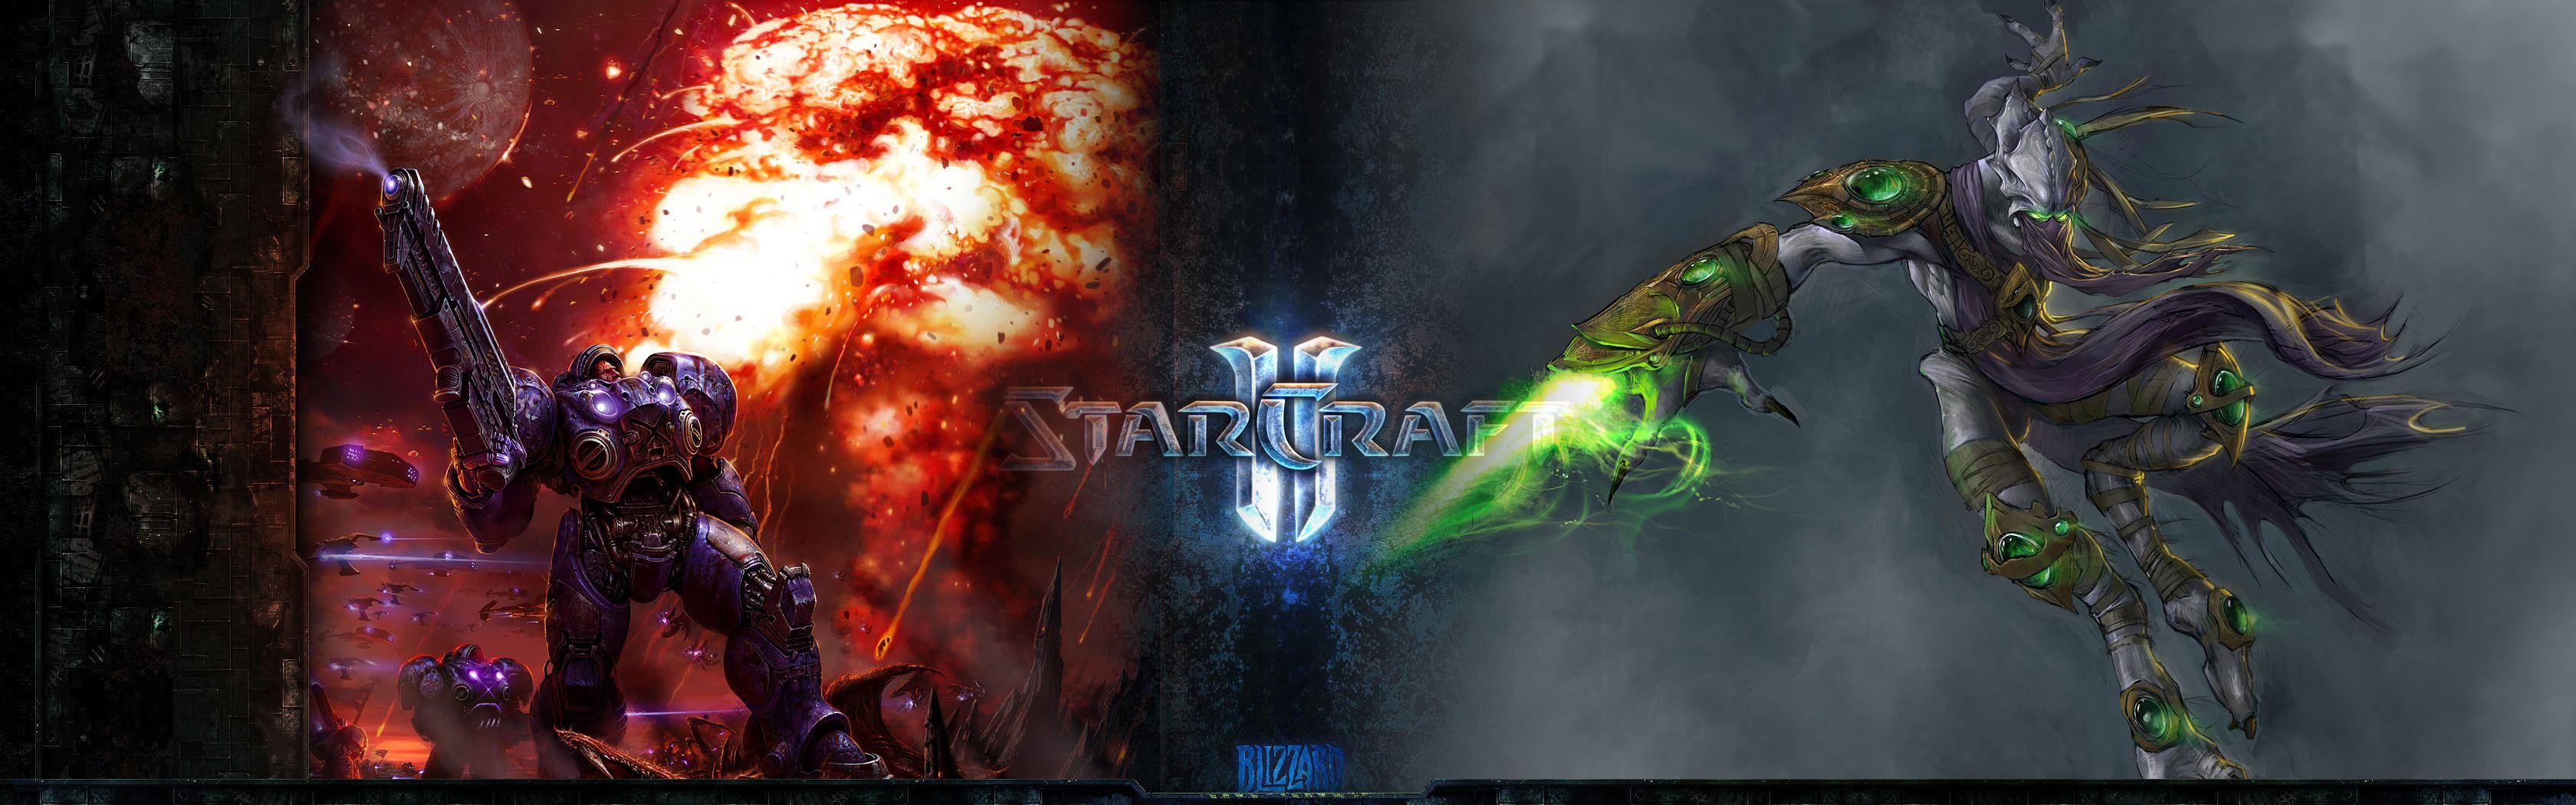 Starcraft Dual Monitor Wallpaper – Terrans and Protoss